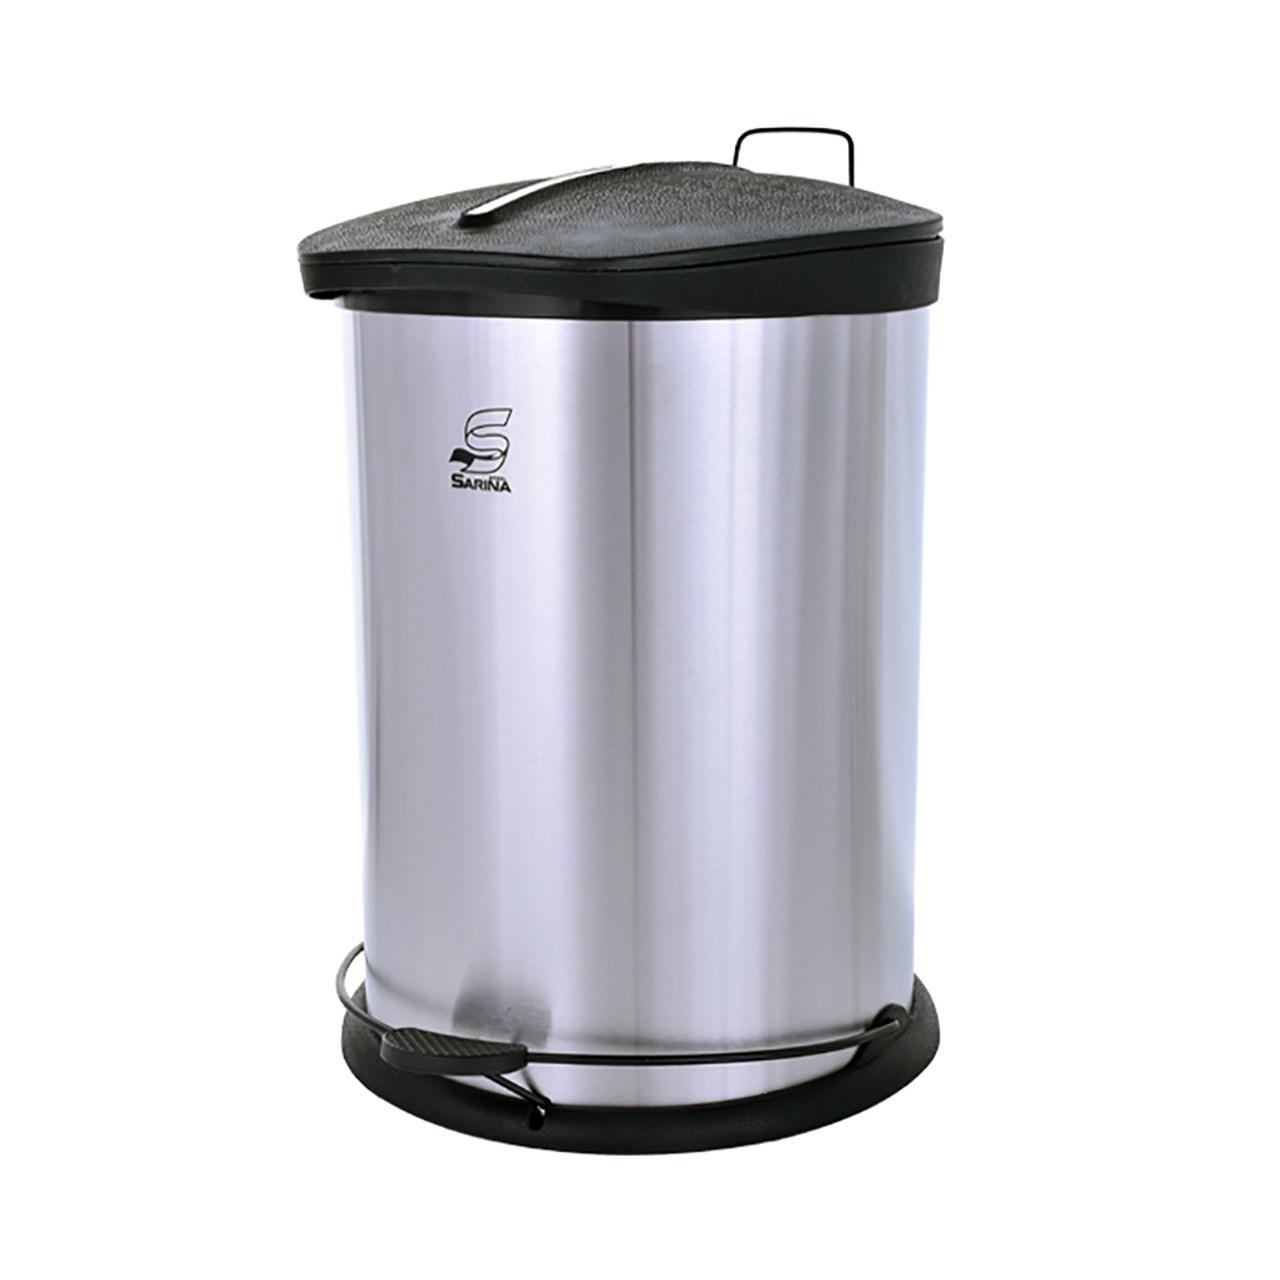 قیمت خرید سطل زباله پدالی 20 لیتری سارینا کد 7550 اورجینال